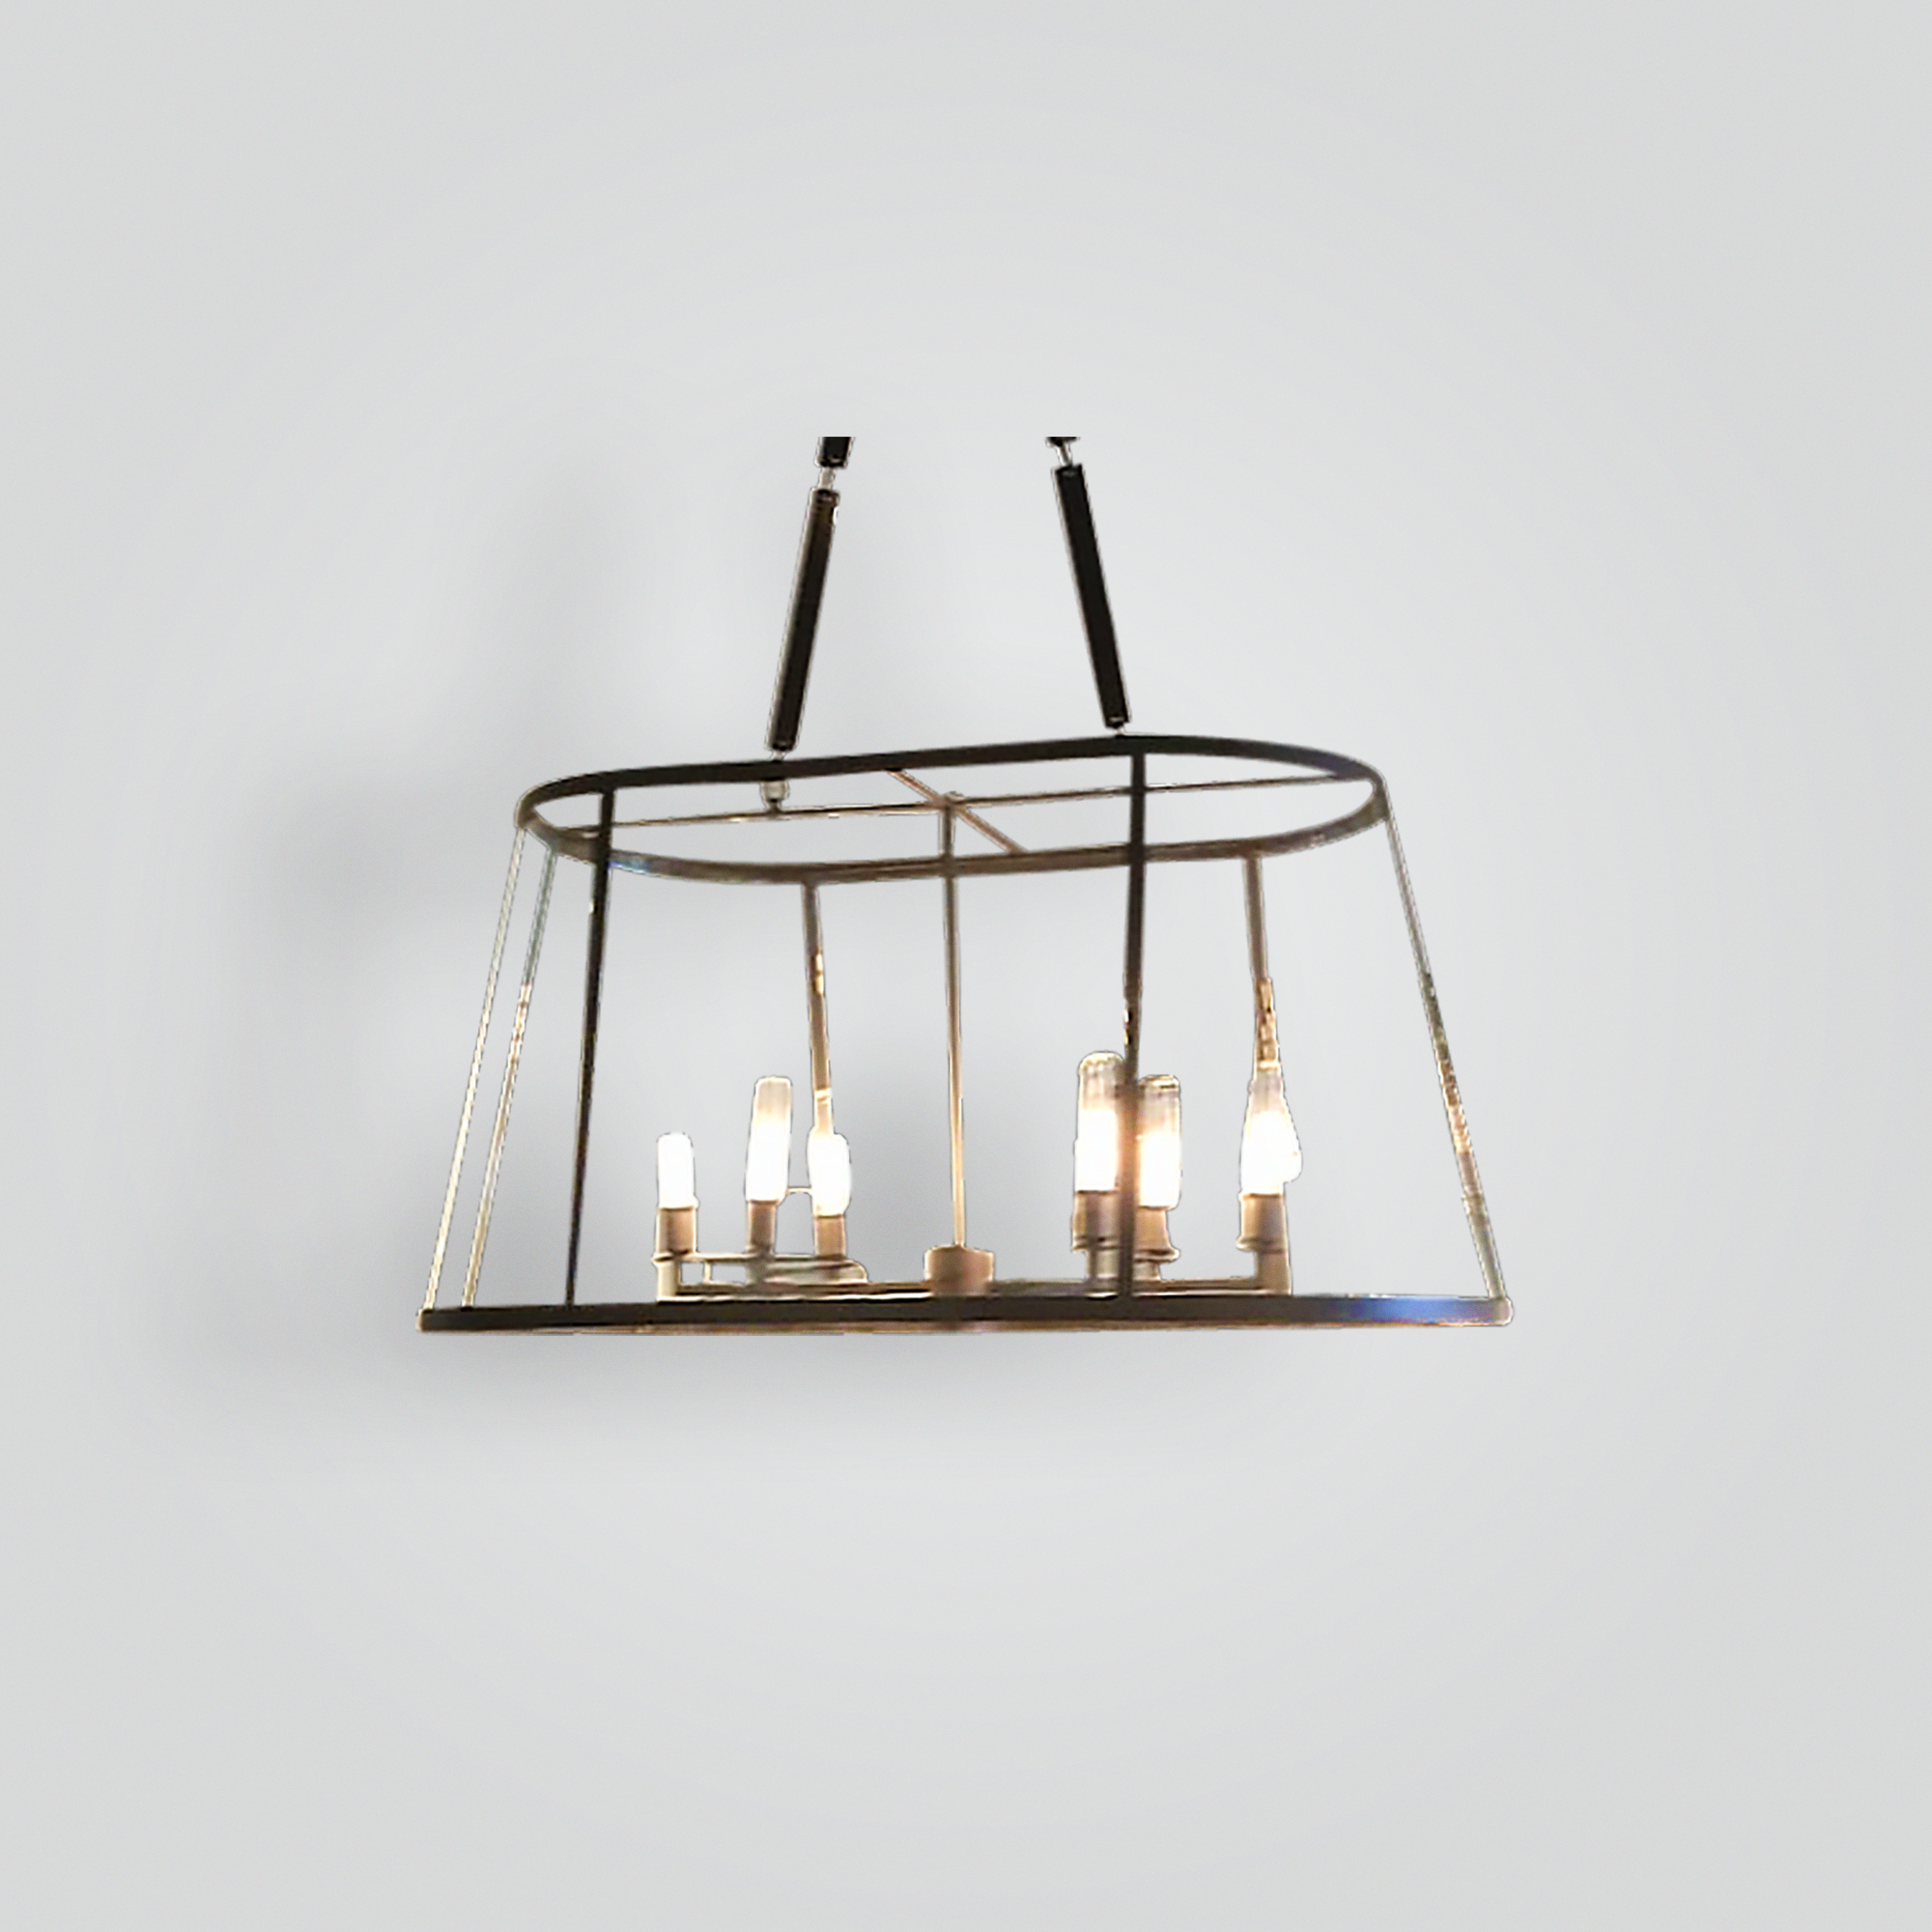 7021 – ADG Lighting Collection